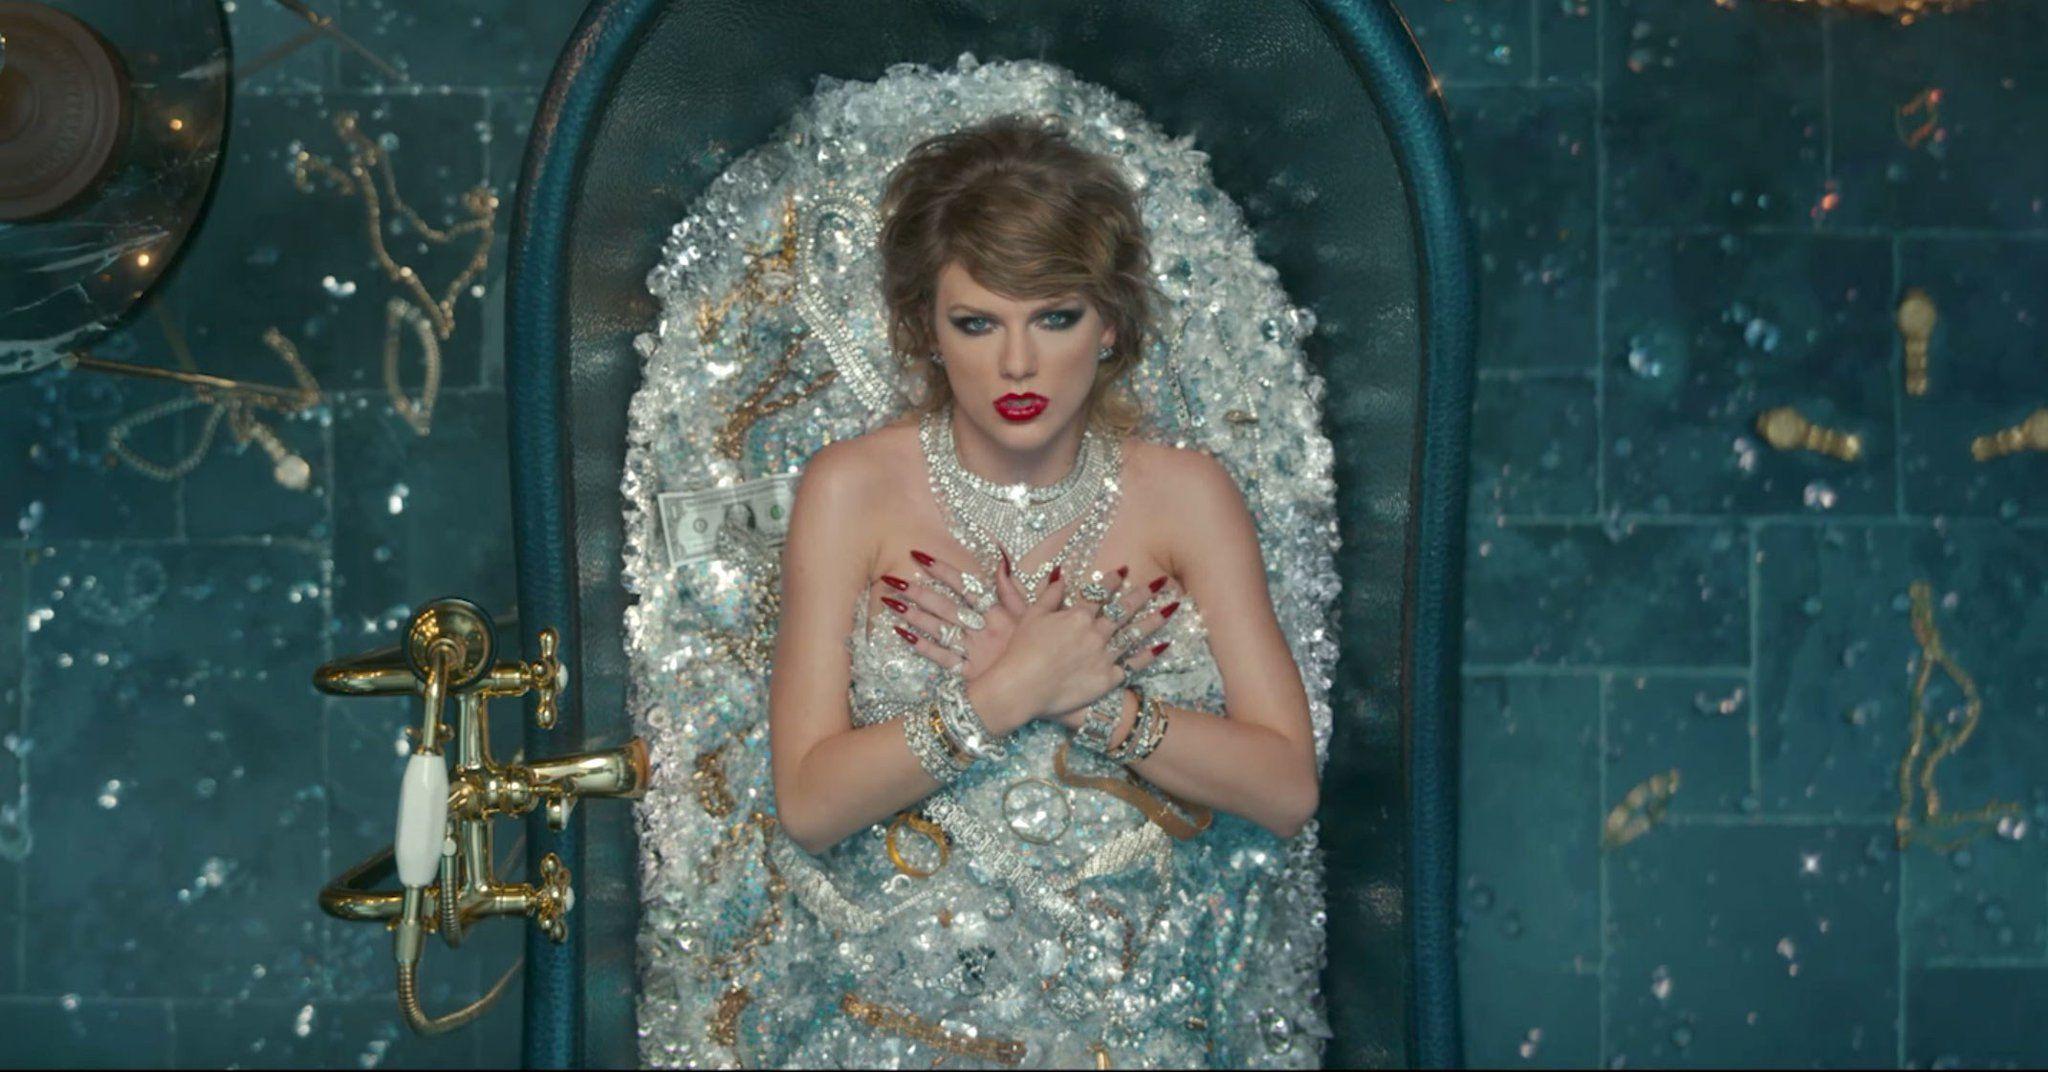 Posh Peep 👀 on Twitter | Taylor swift videos, Taylor swift ...